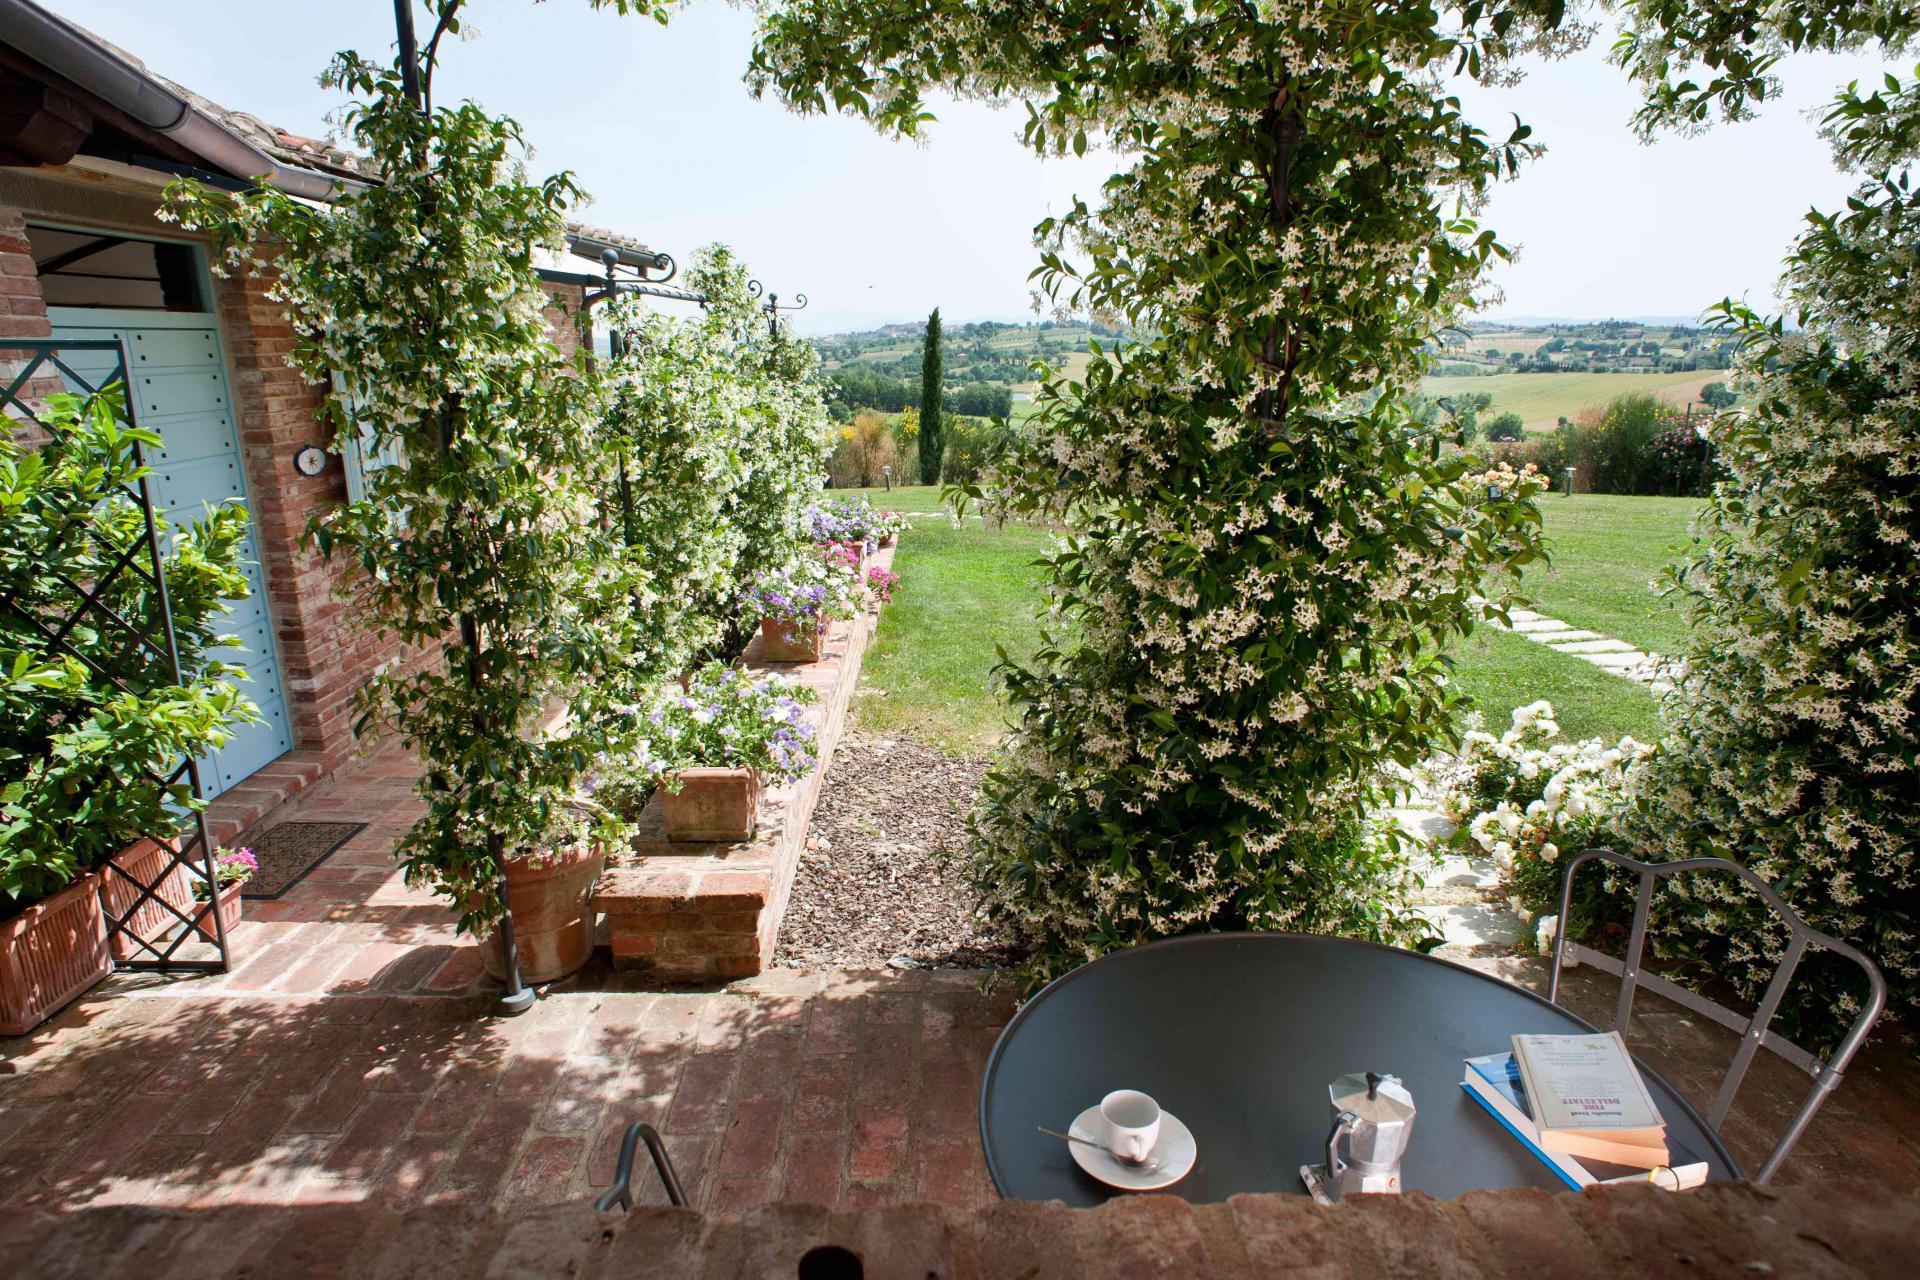 Agriturismo Toscana Agriturismo per bambini in Toscana vicino al mare